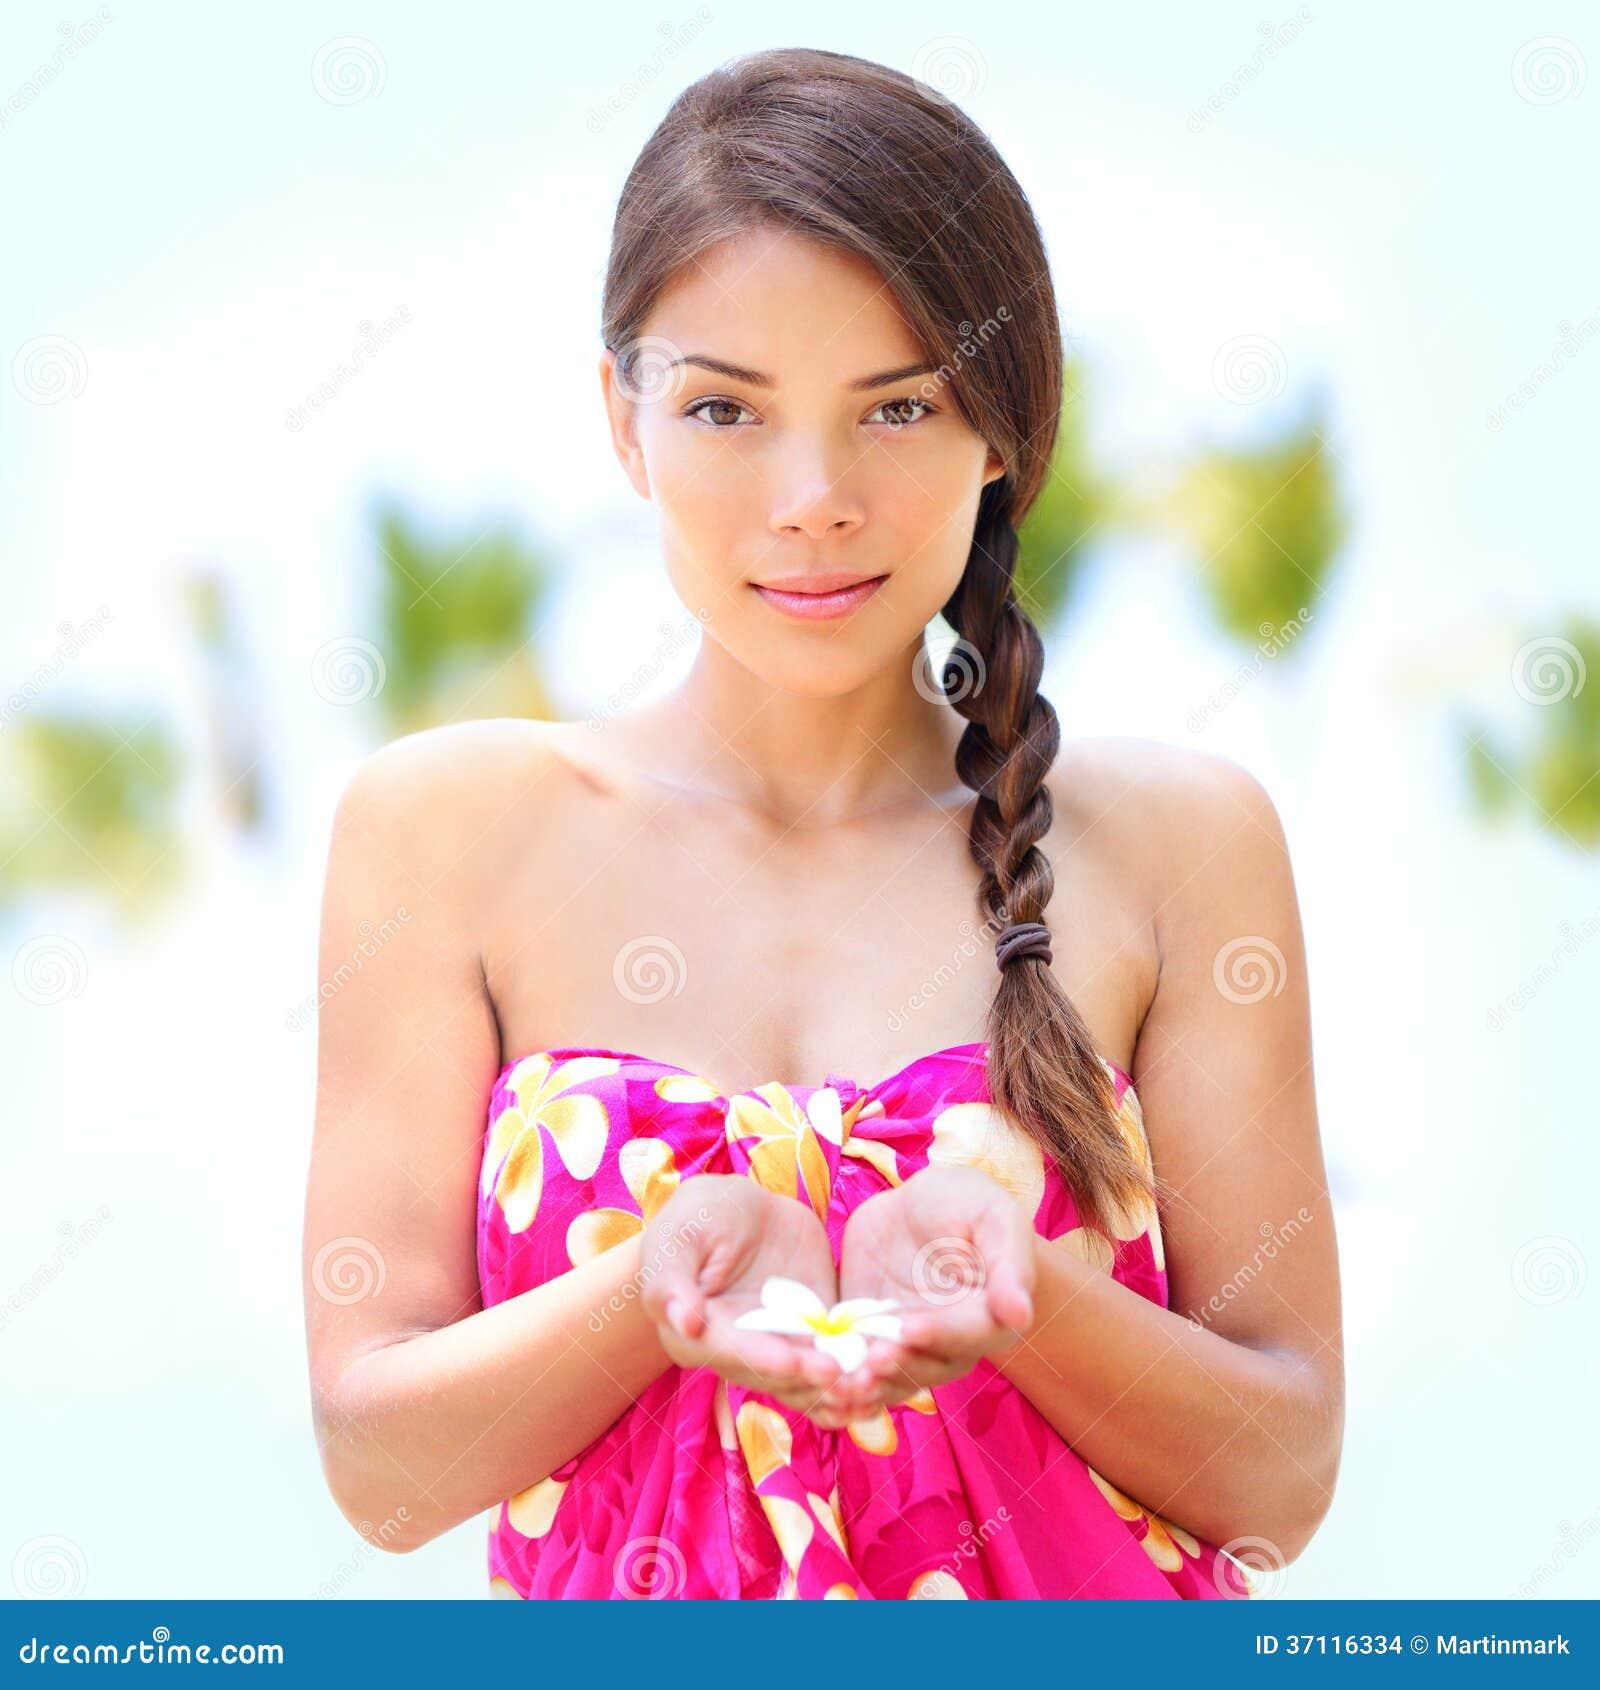 women seek pretty mixxed asian